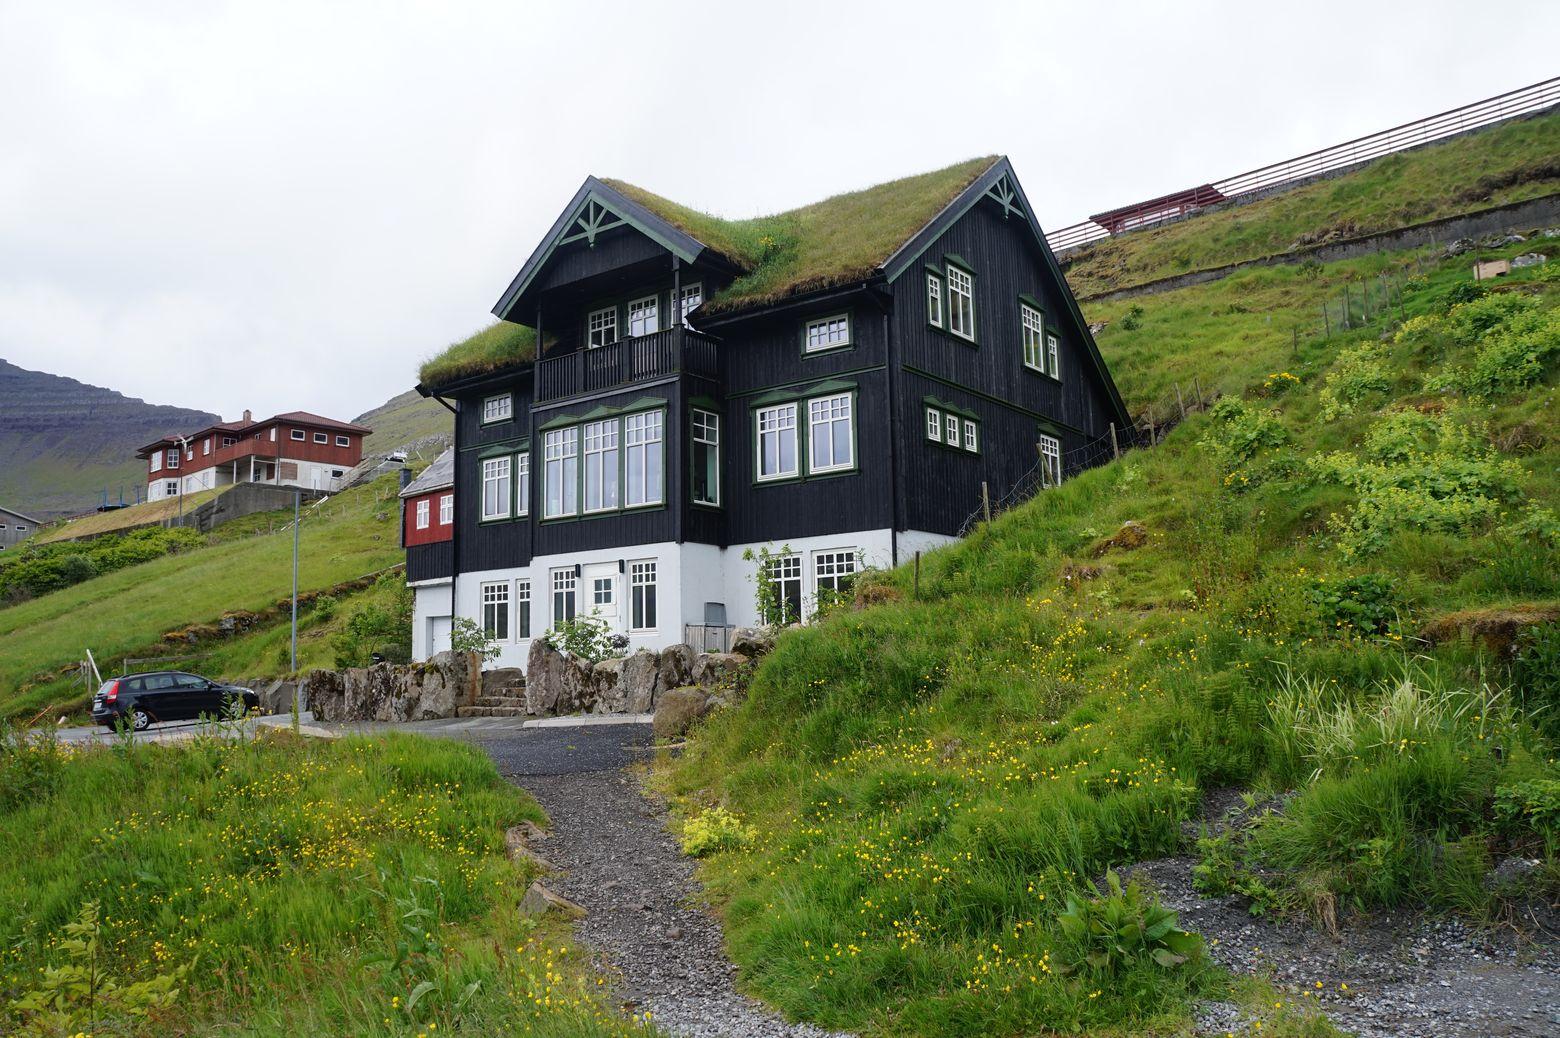 Фарерские острова. Типичная архитектура